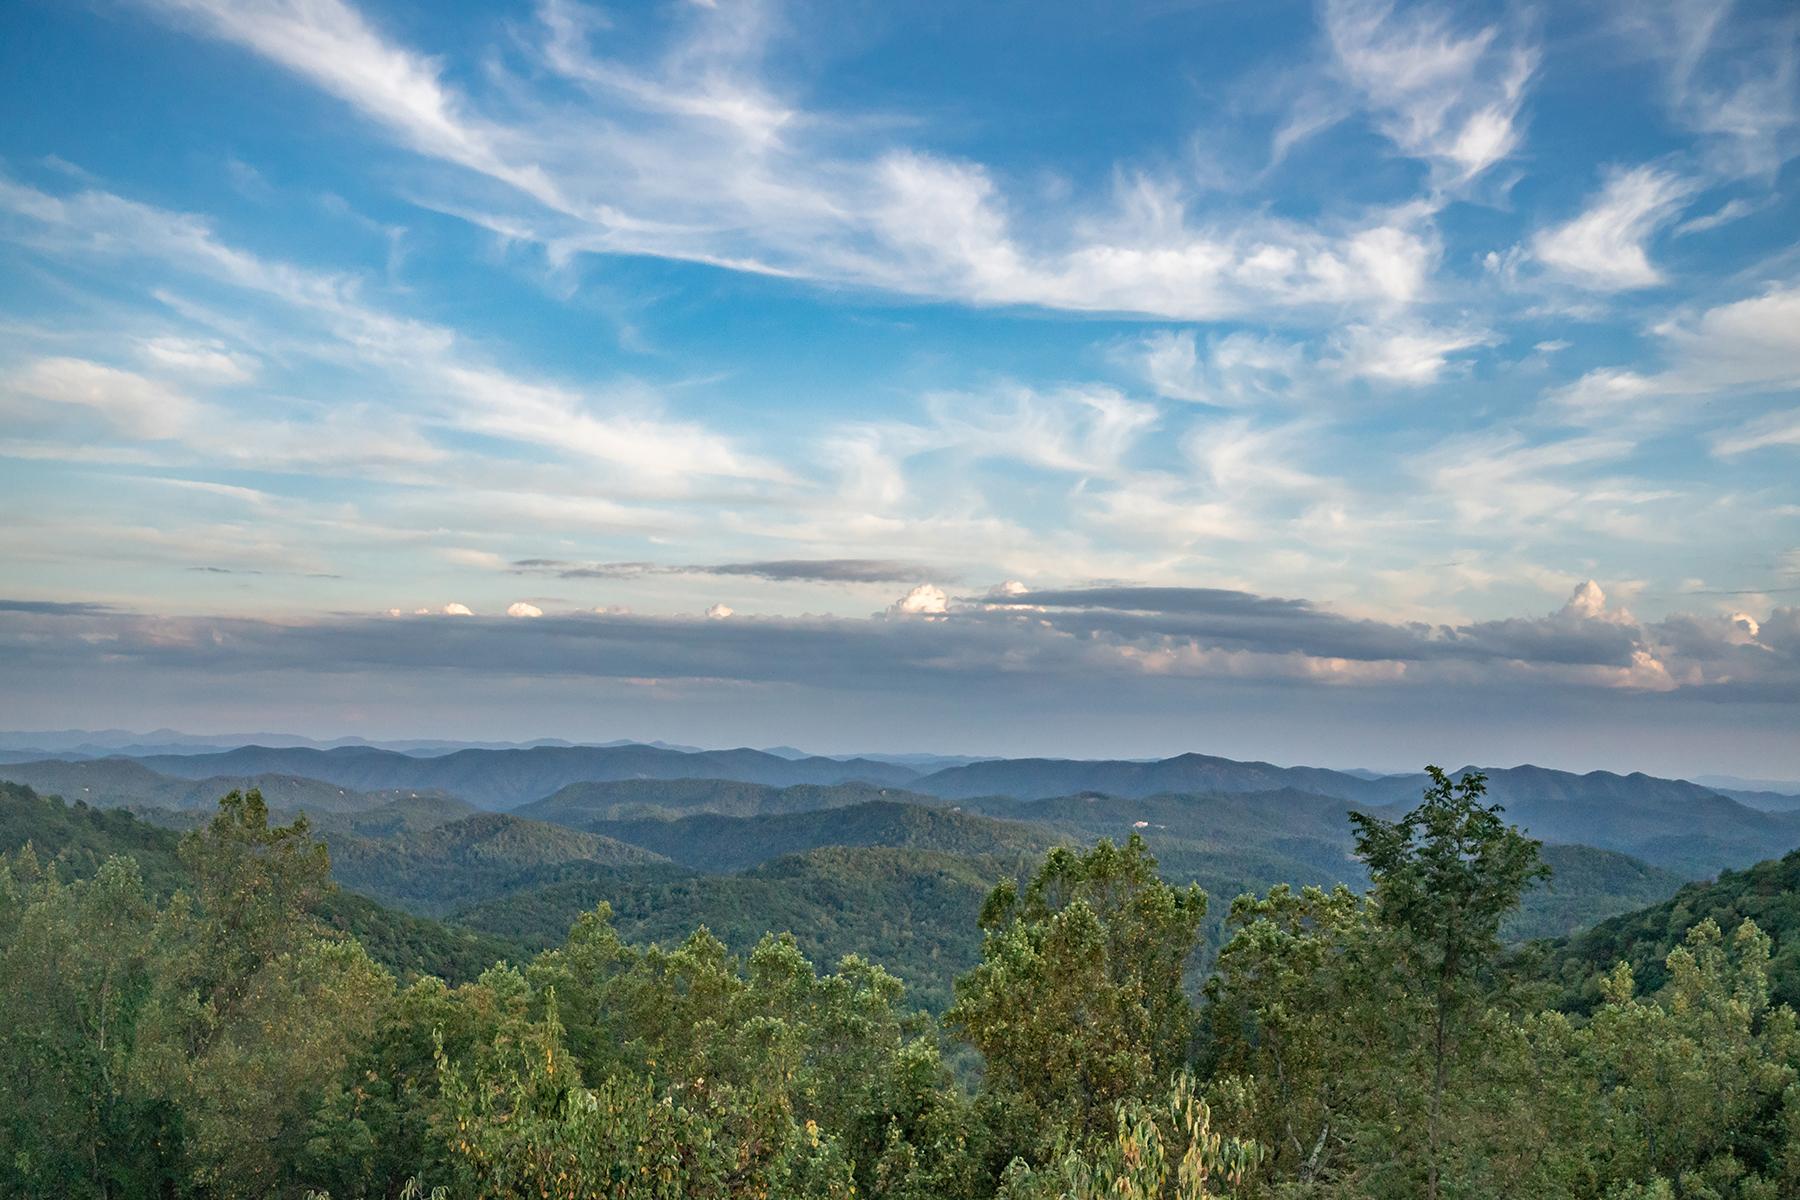 Single Family Homes for Sale at THUNDERHILL ESTATES - BOONE 1469 Orchard Ln Boone, North Carolina 28607 United States